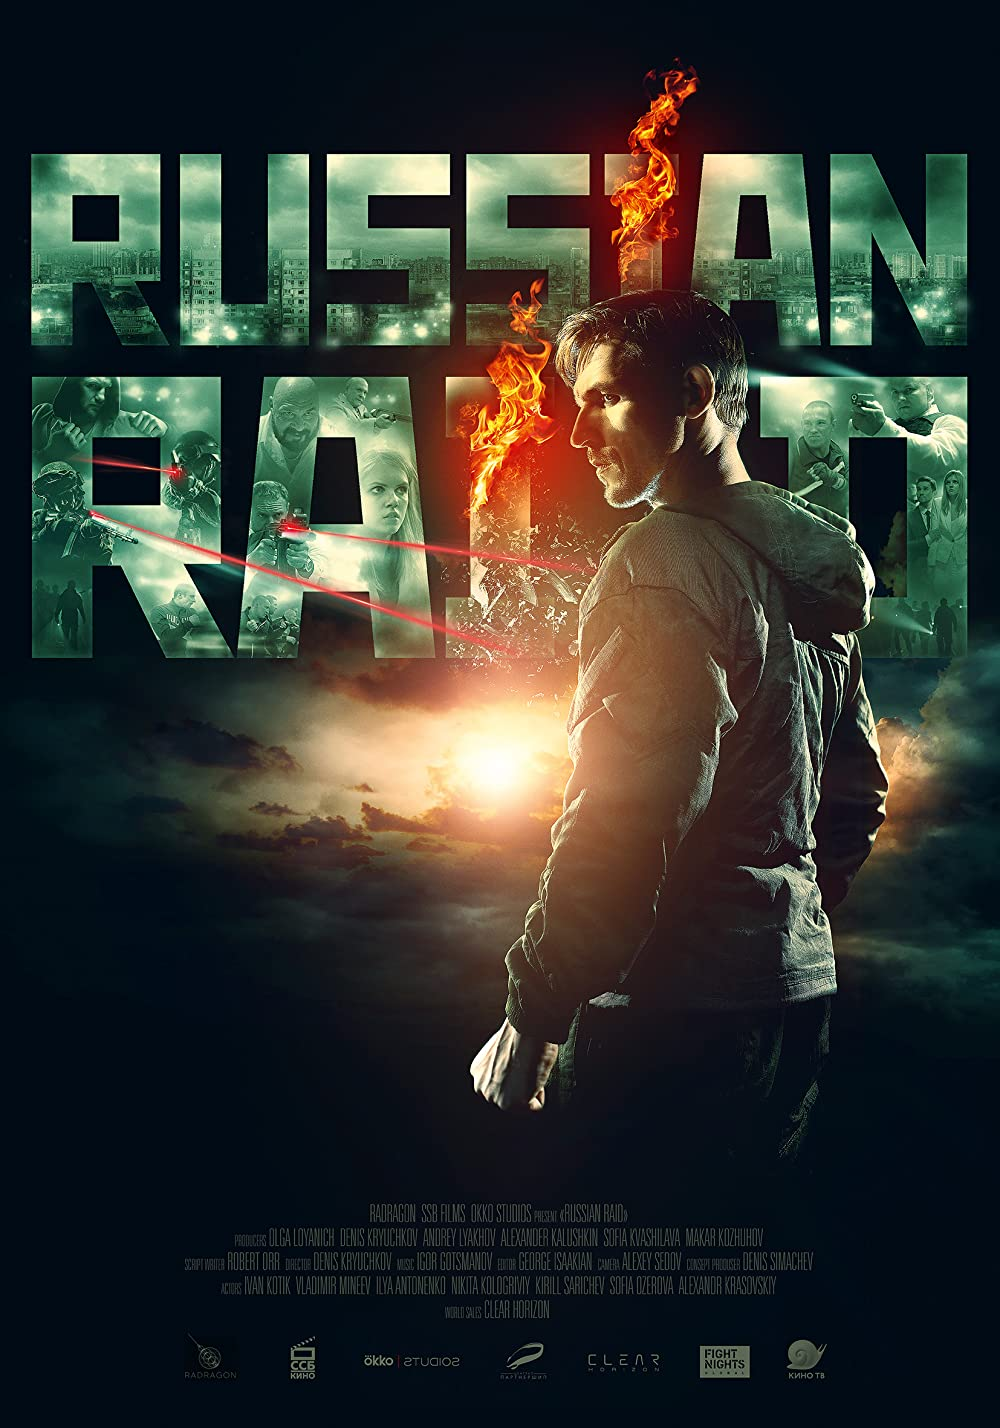 Download Filme Missão Rússia Qualidade Hd